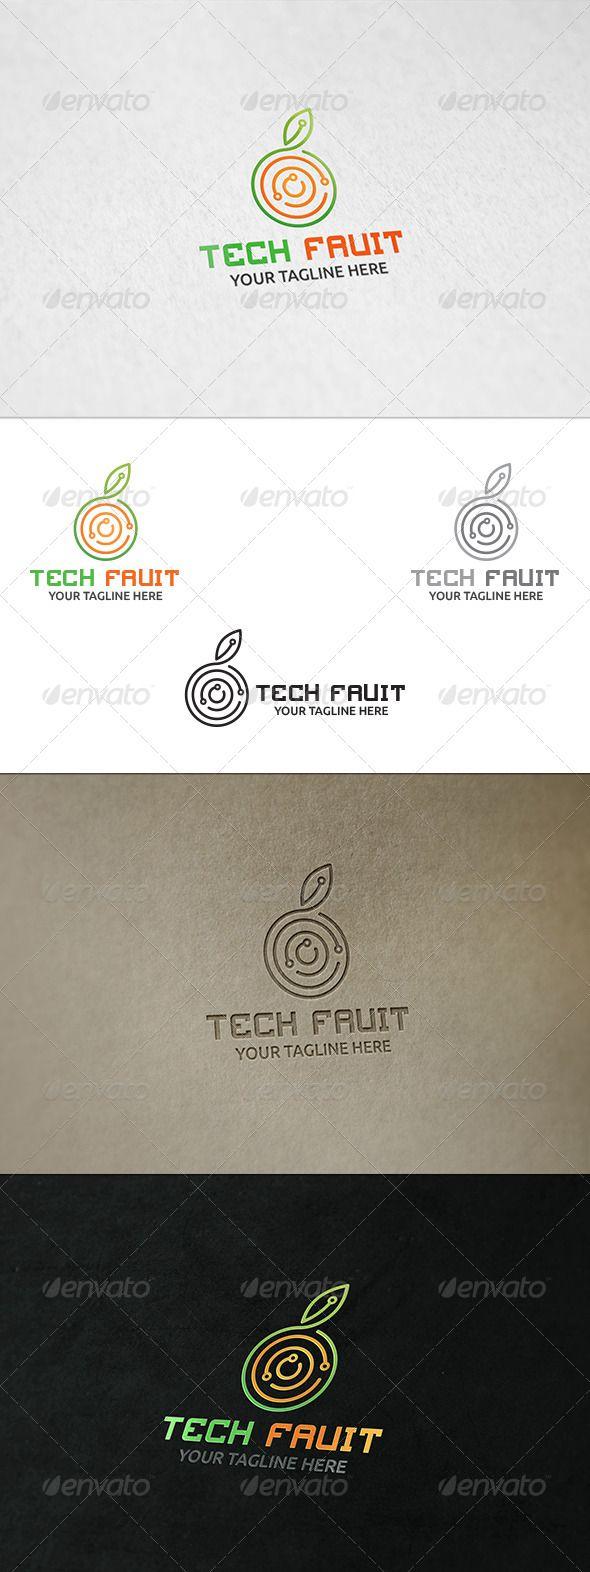 Tech Fruit  - Logo Design Template Vector #logotype Download it here: http://graphicriver.net/item/tech-fruit-logo-template/8539642?s_rank=1400?ref=nexion